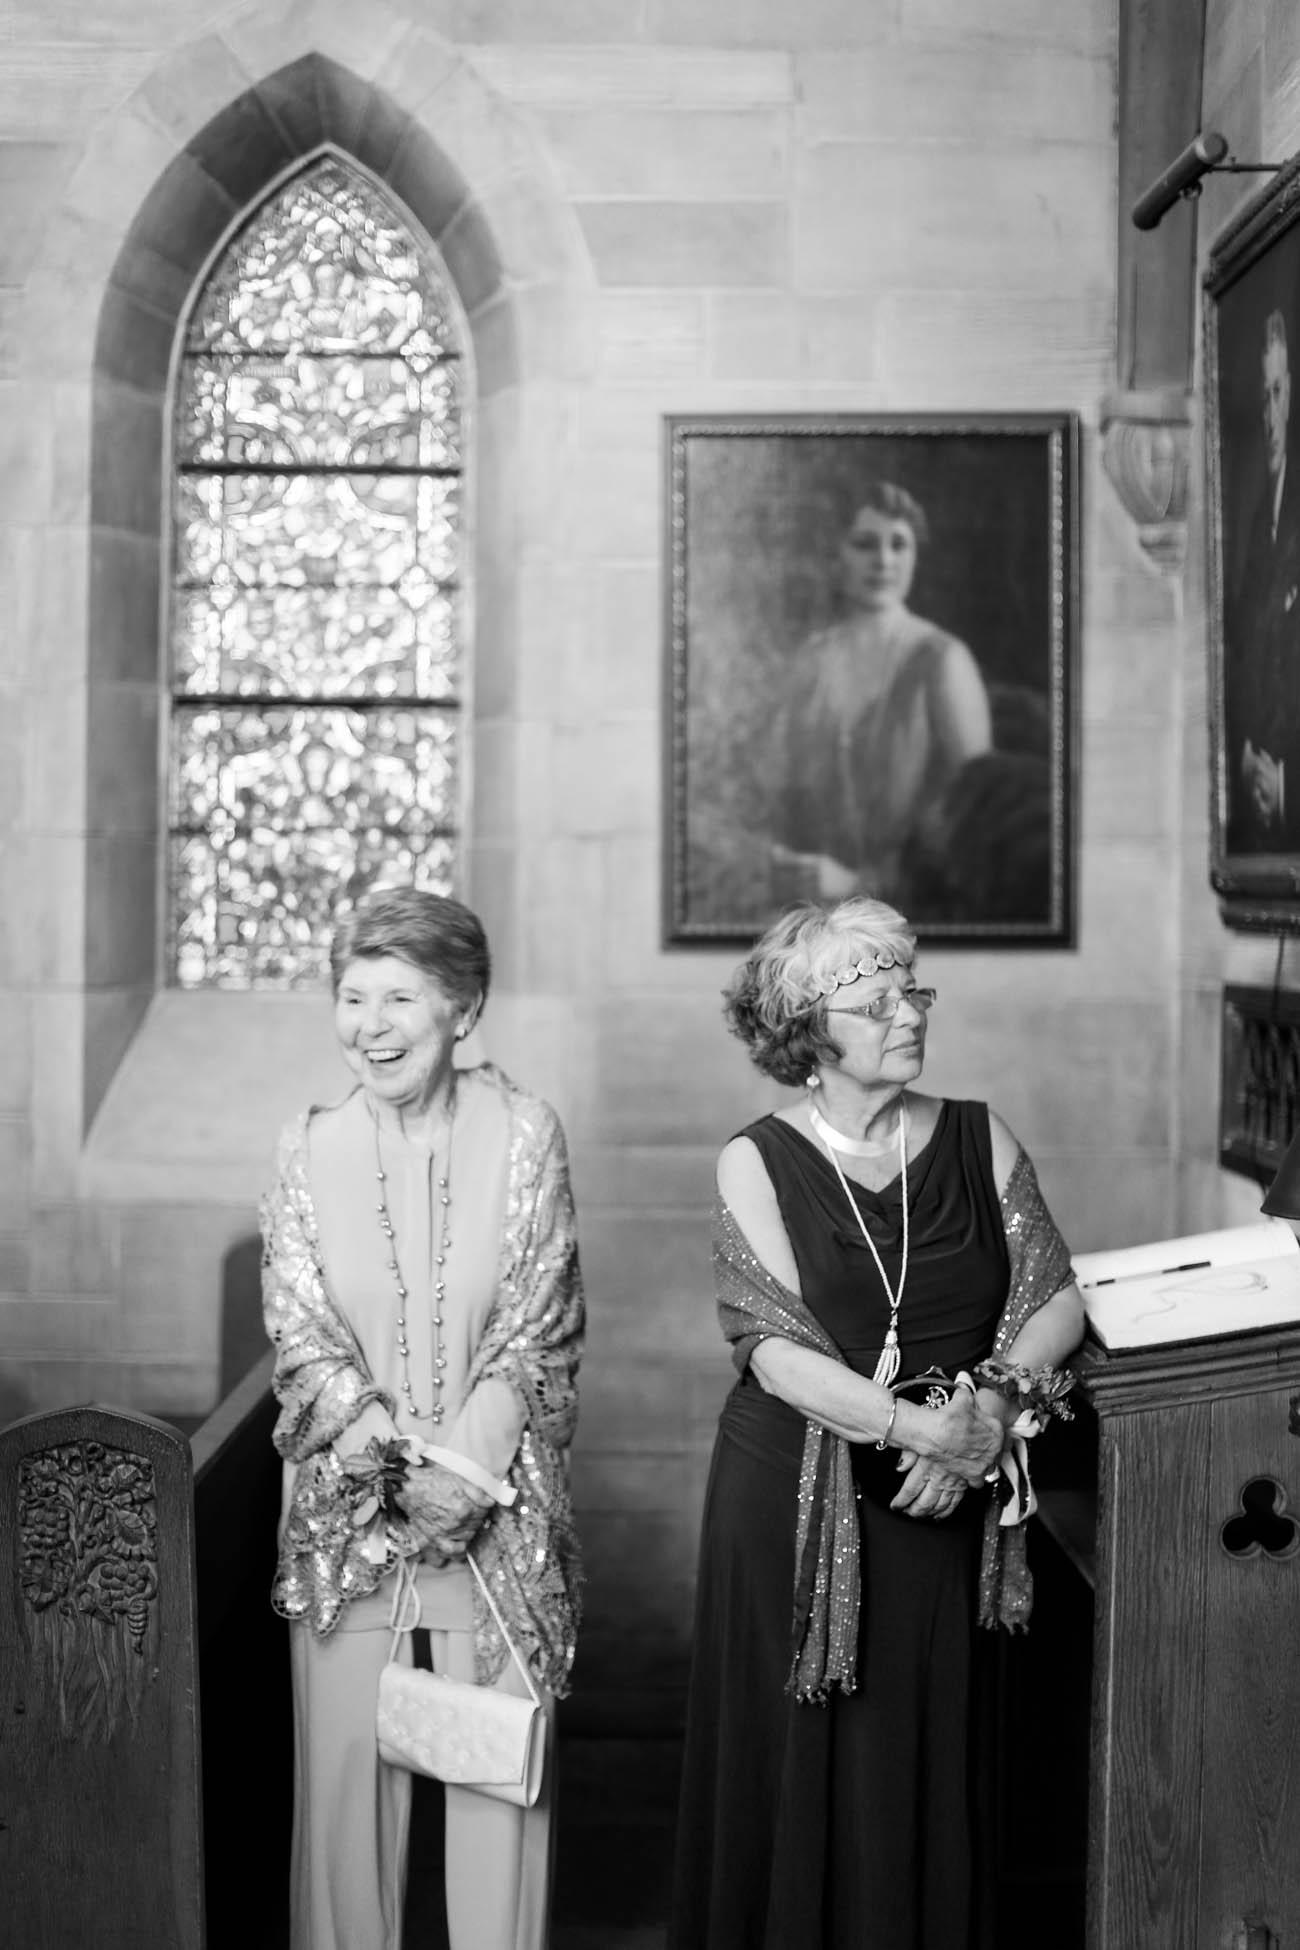 Speakeasy-1920s-theme-Louisville-and-Lexington Wedding-153.jpg